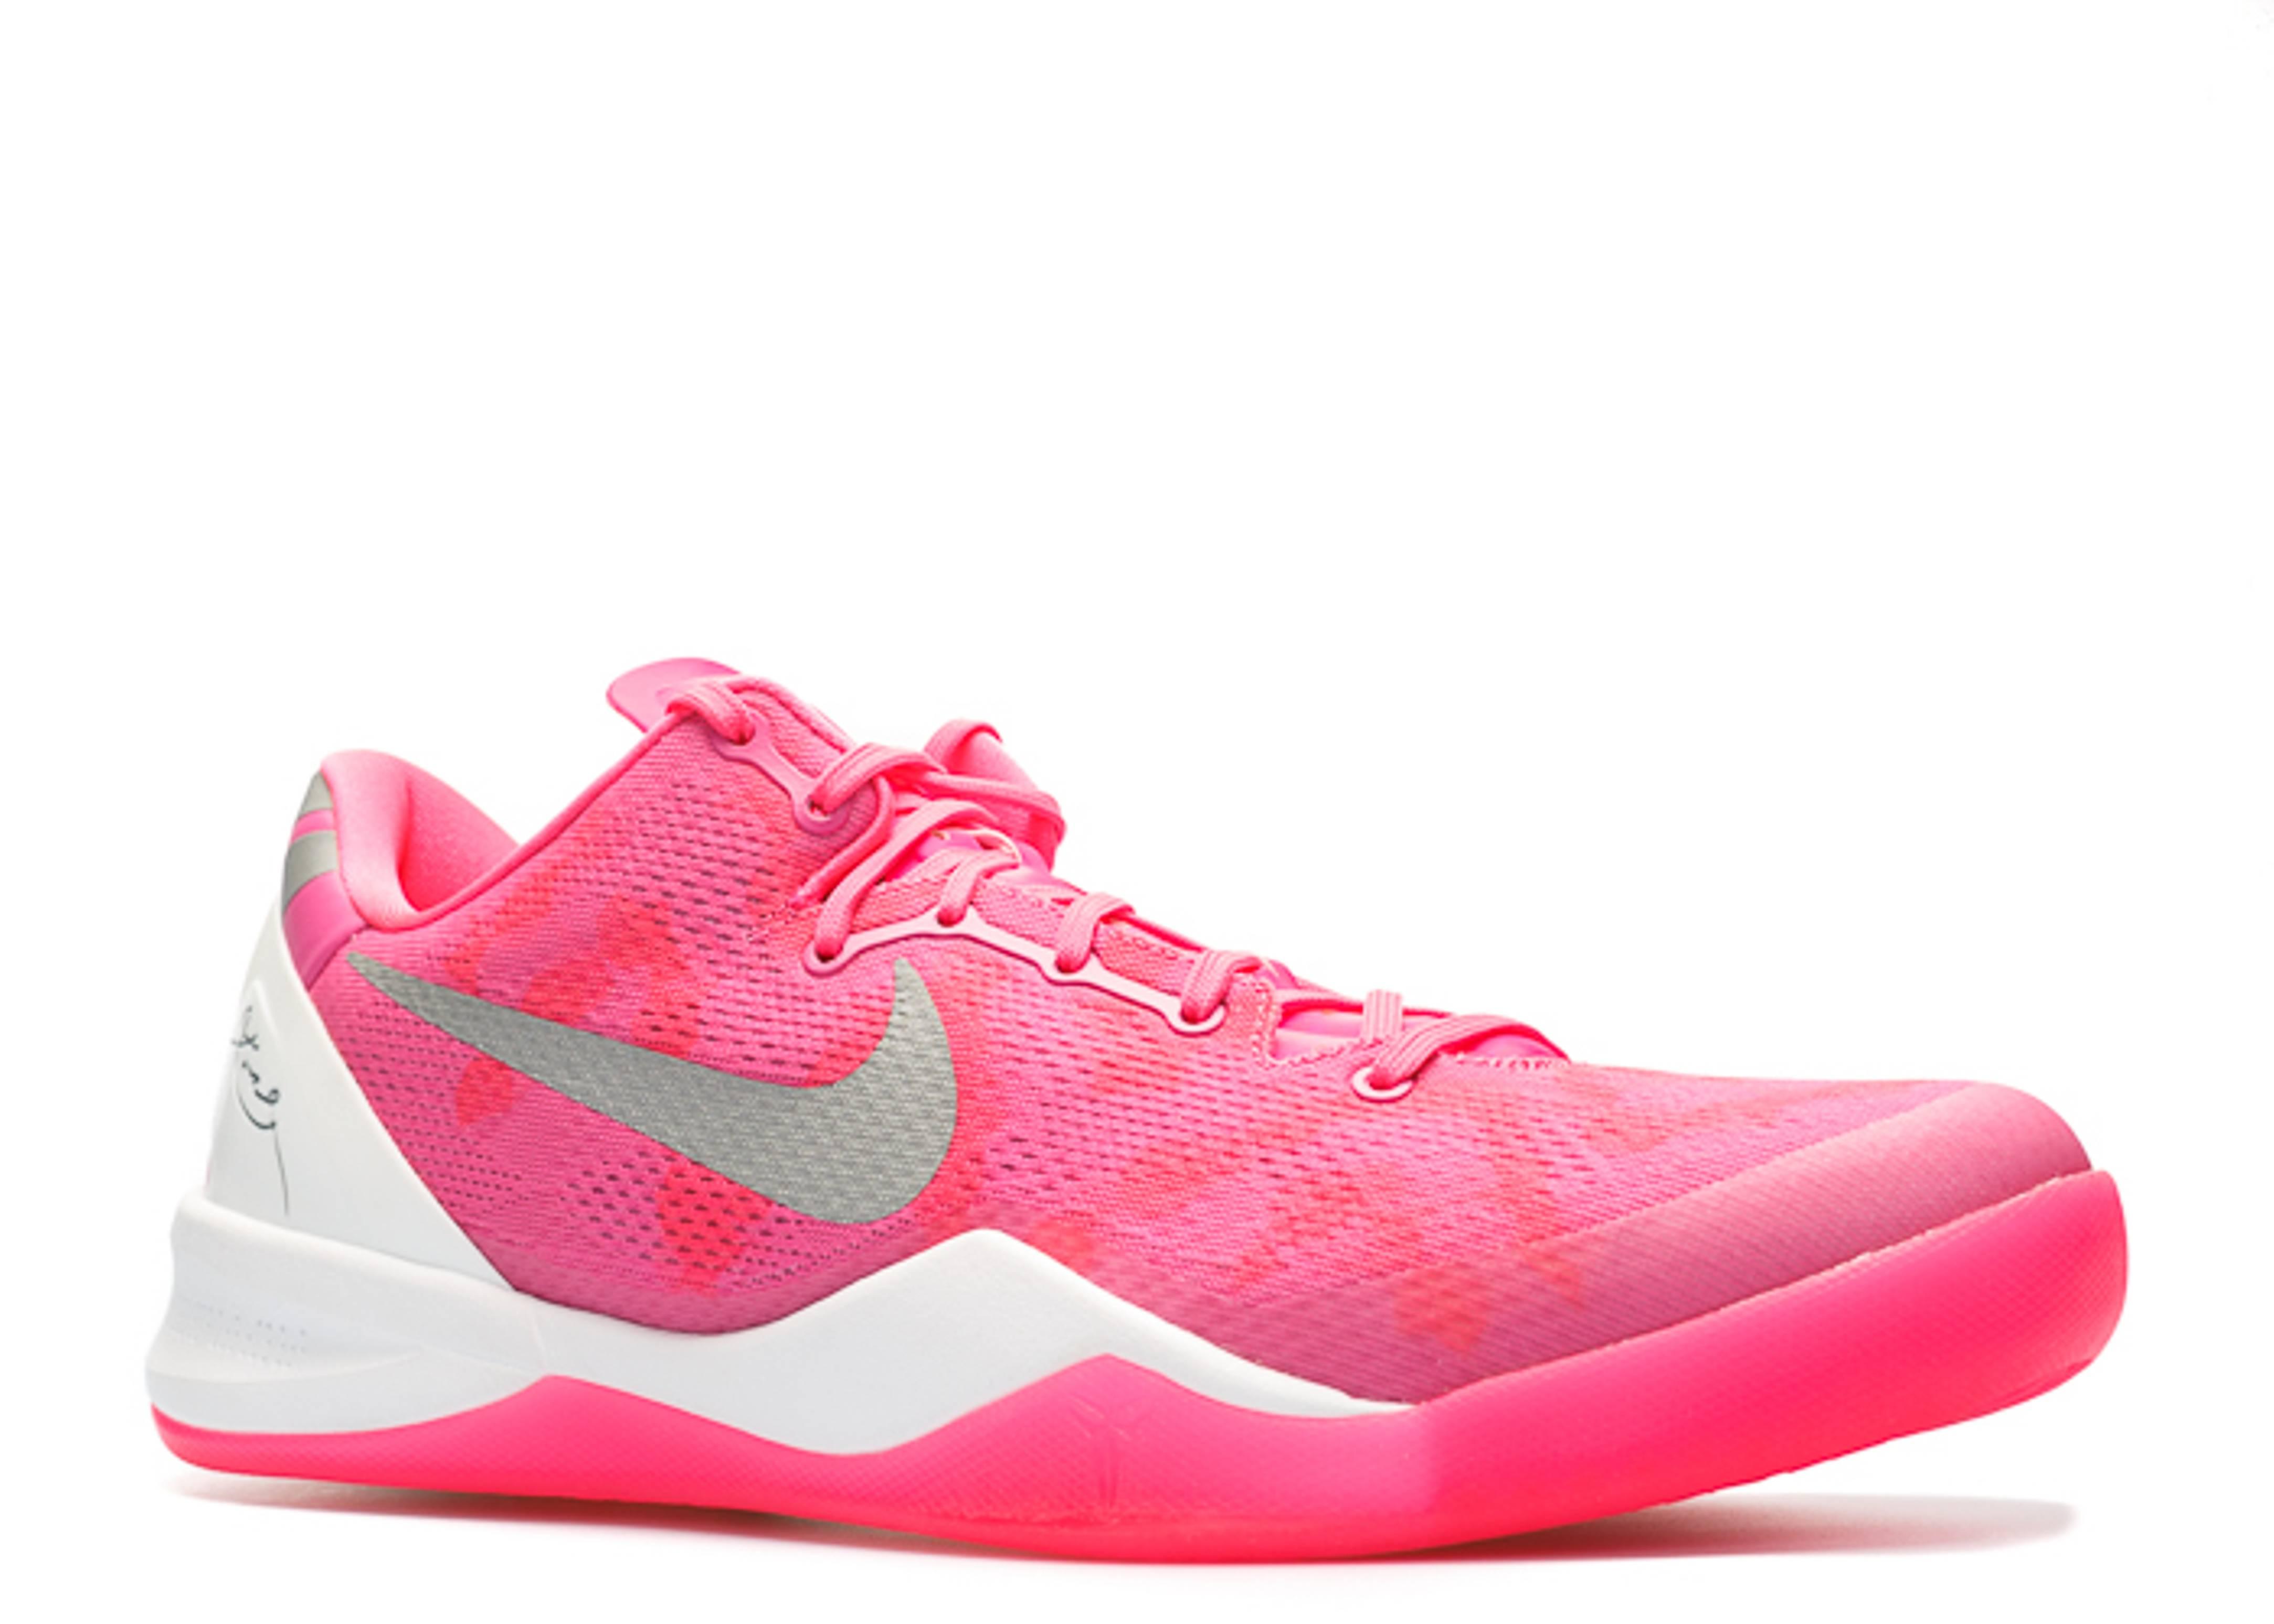 d8e7a7d2d3aa Nike Kobe 8 Viii System In Size 6